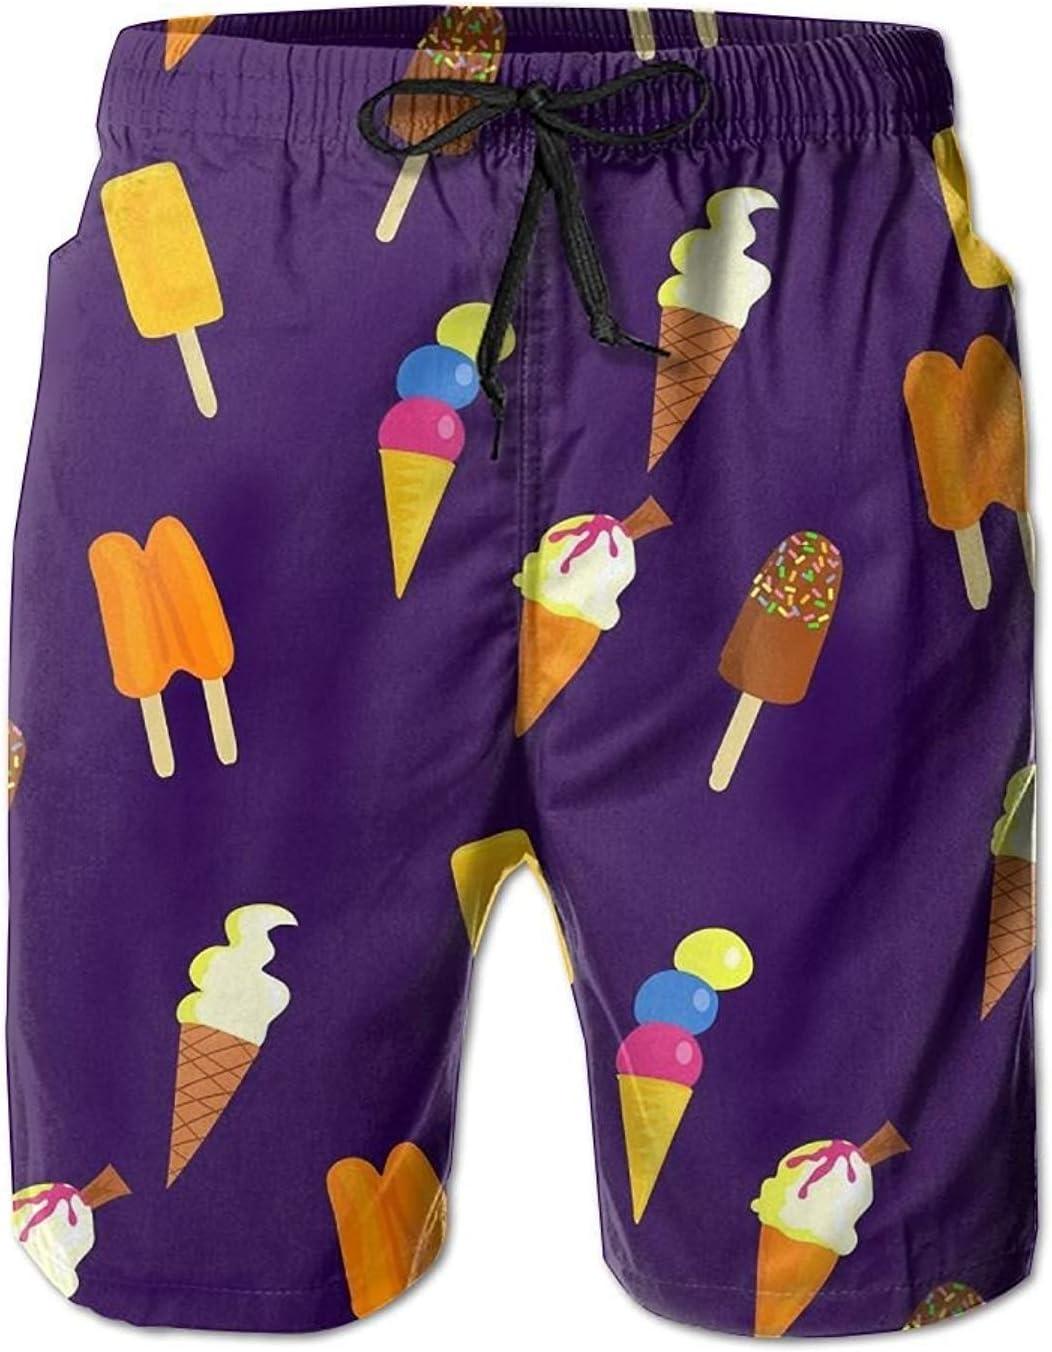 Mens Ice Cream Colorful Pattern Swim Trunks Boardshorts with Pokets Beach Shorts